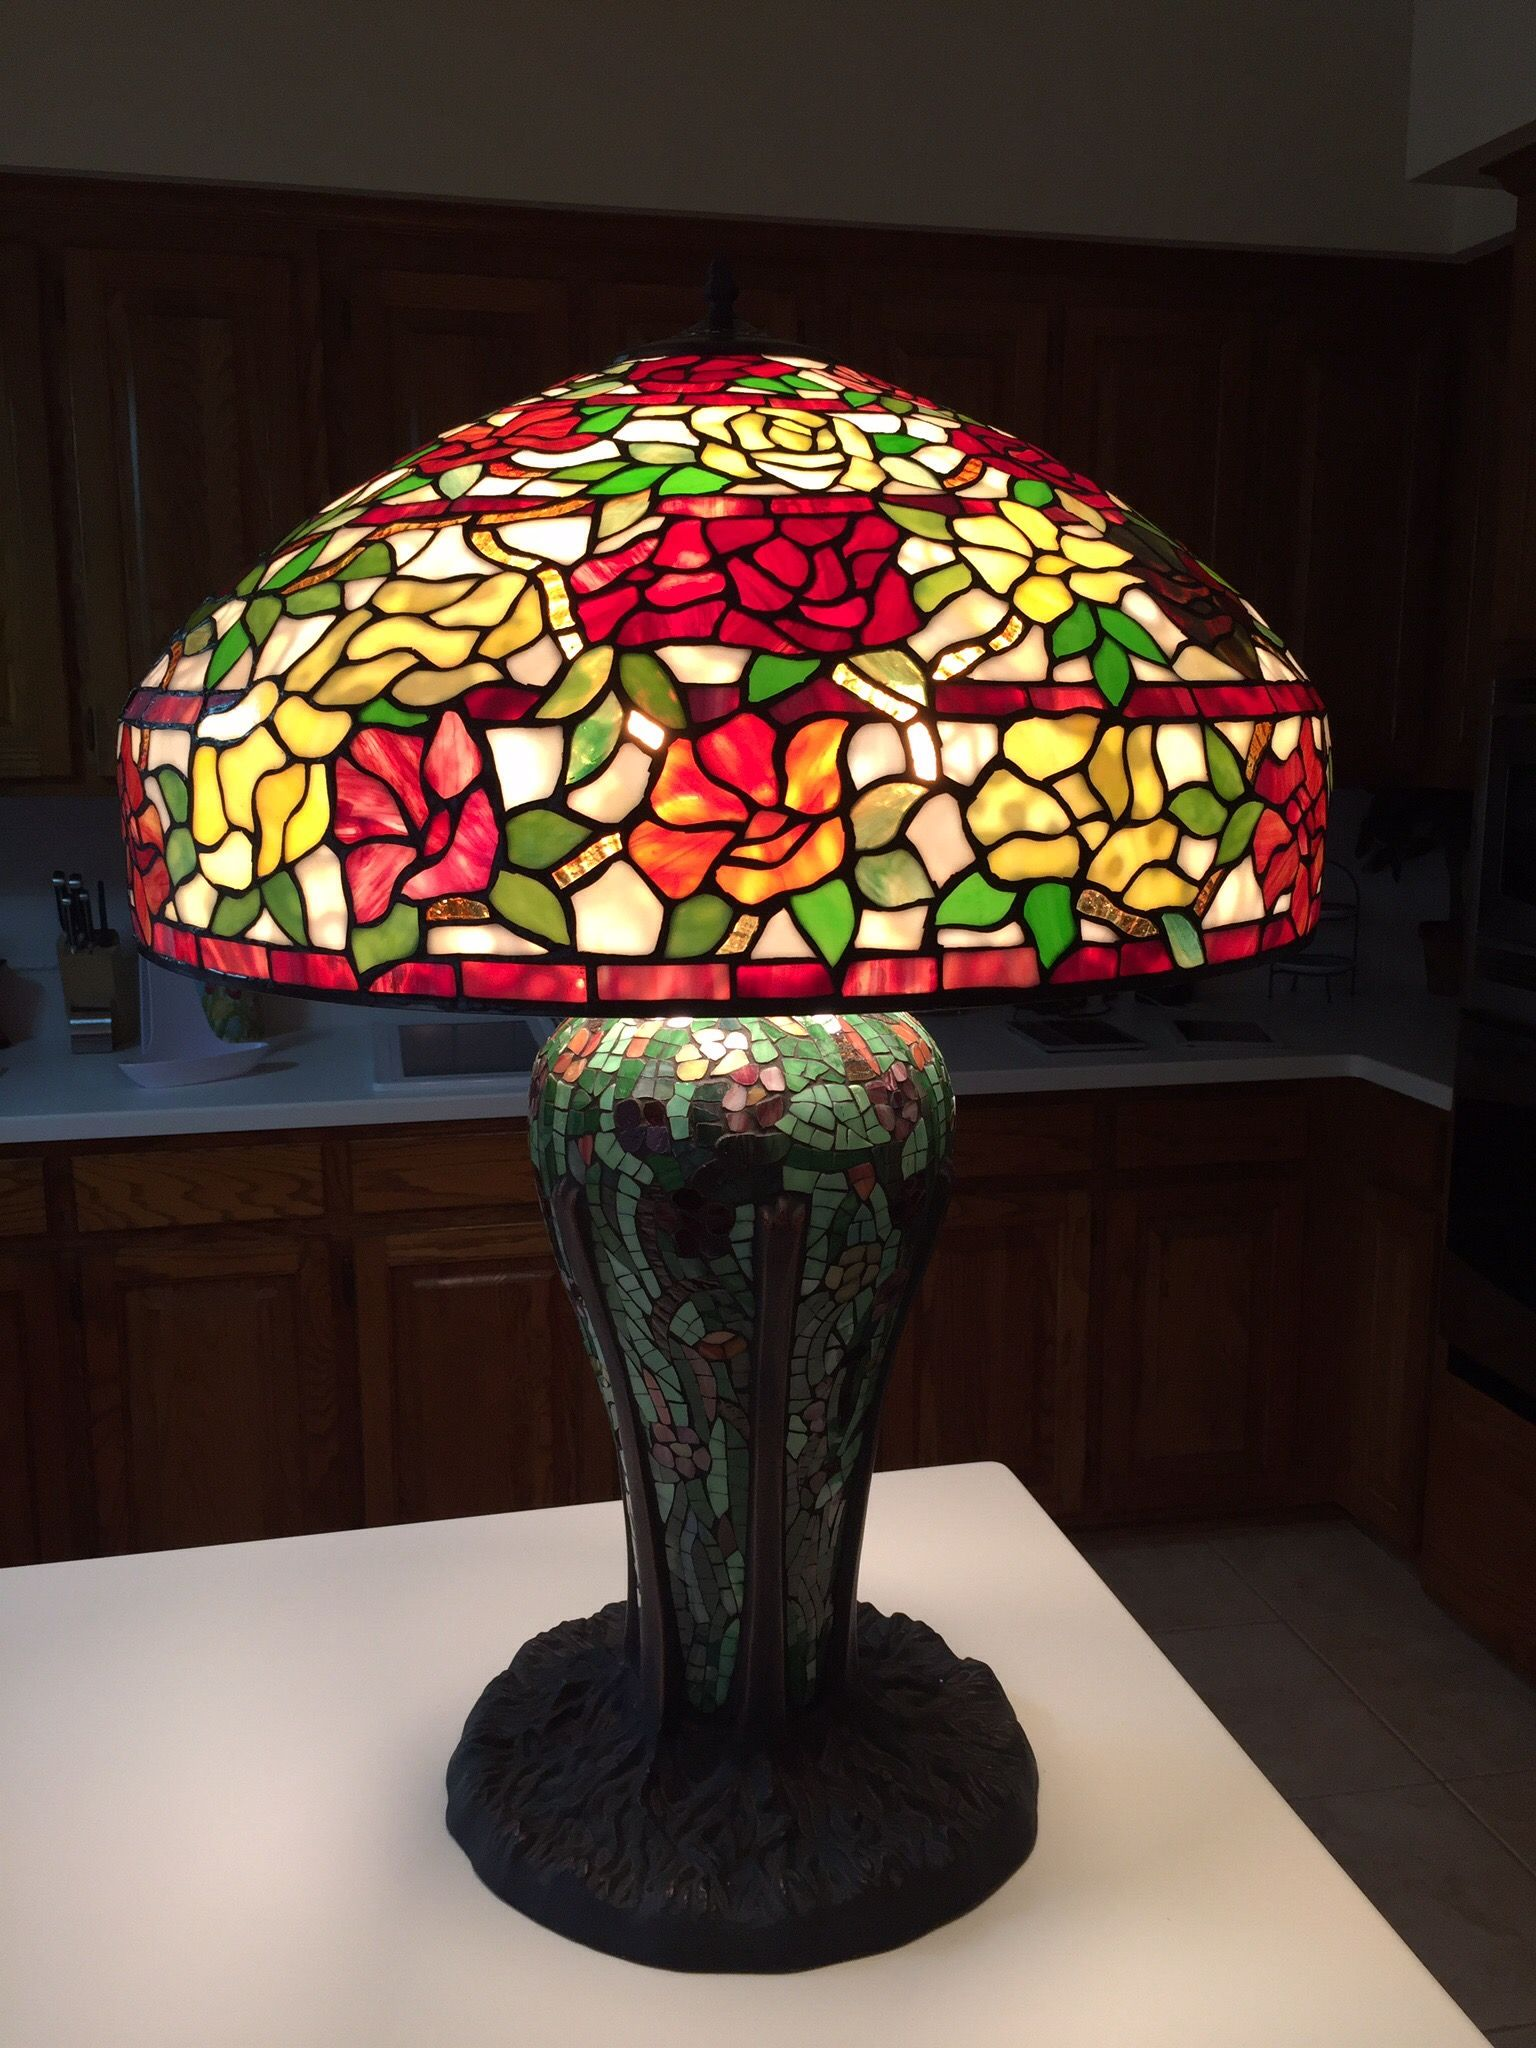 Pin di Marianne Turner su Tiffany lamps Lampade tiffany